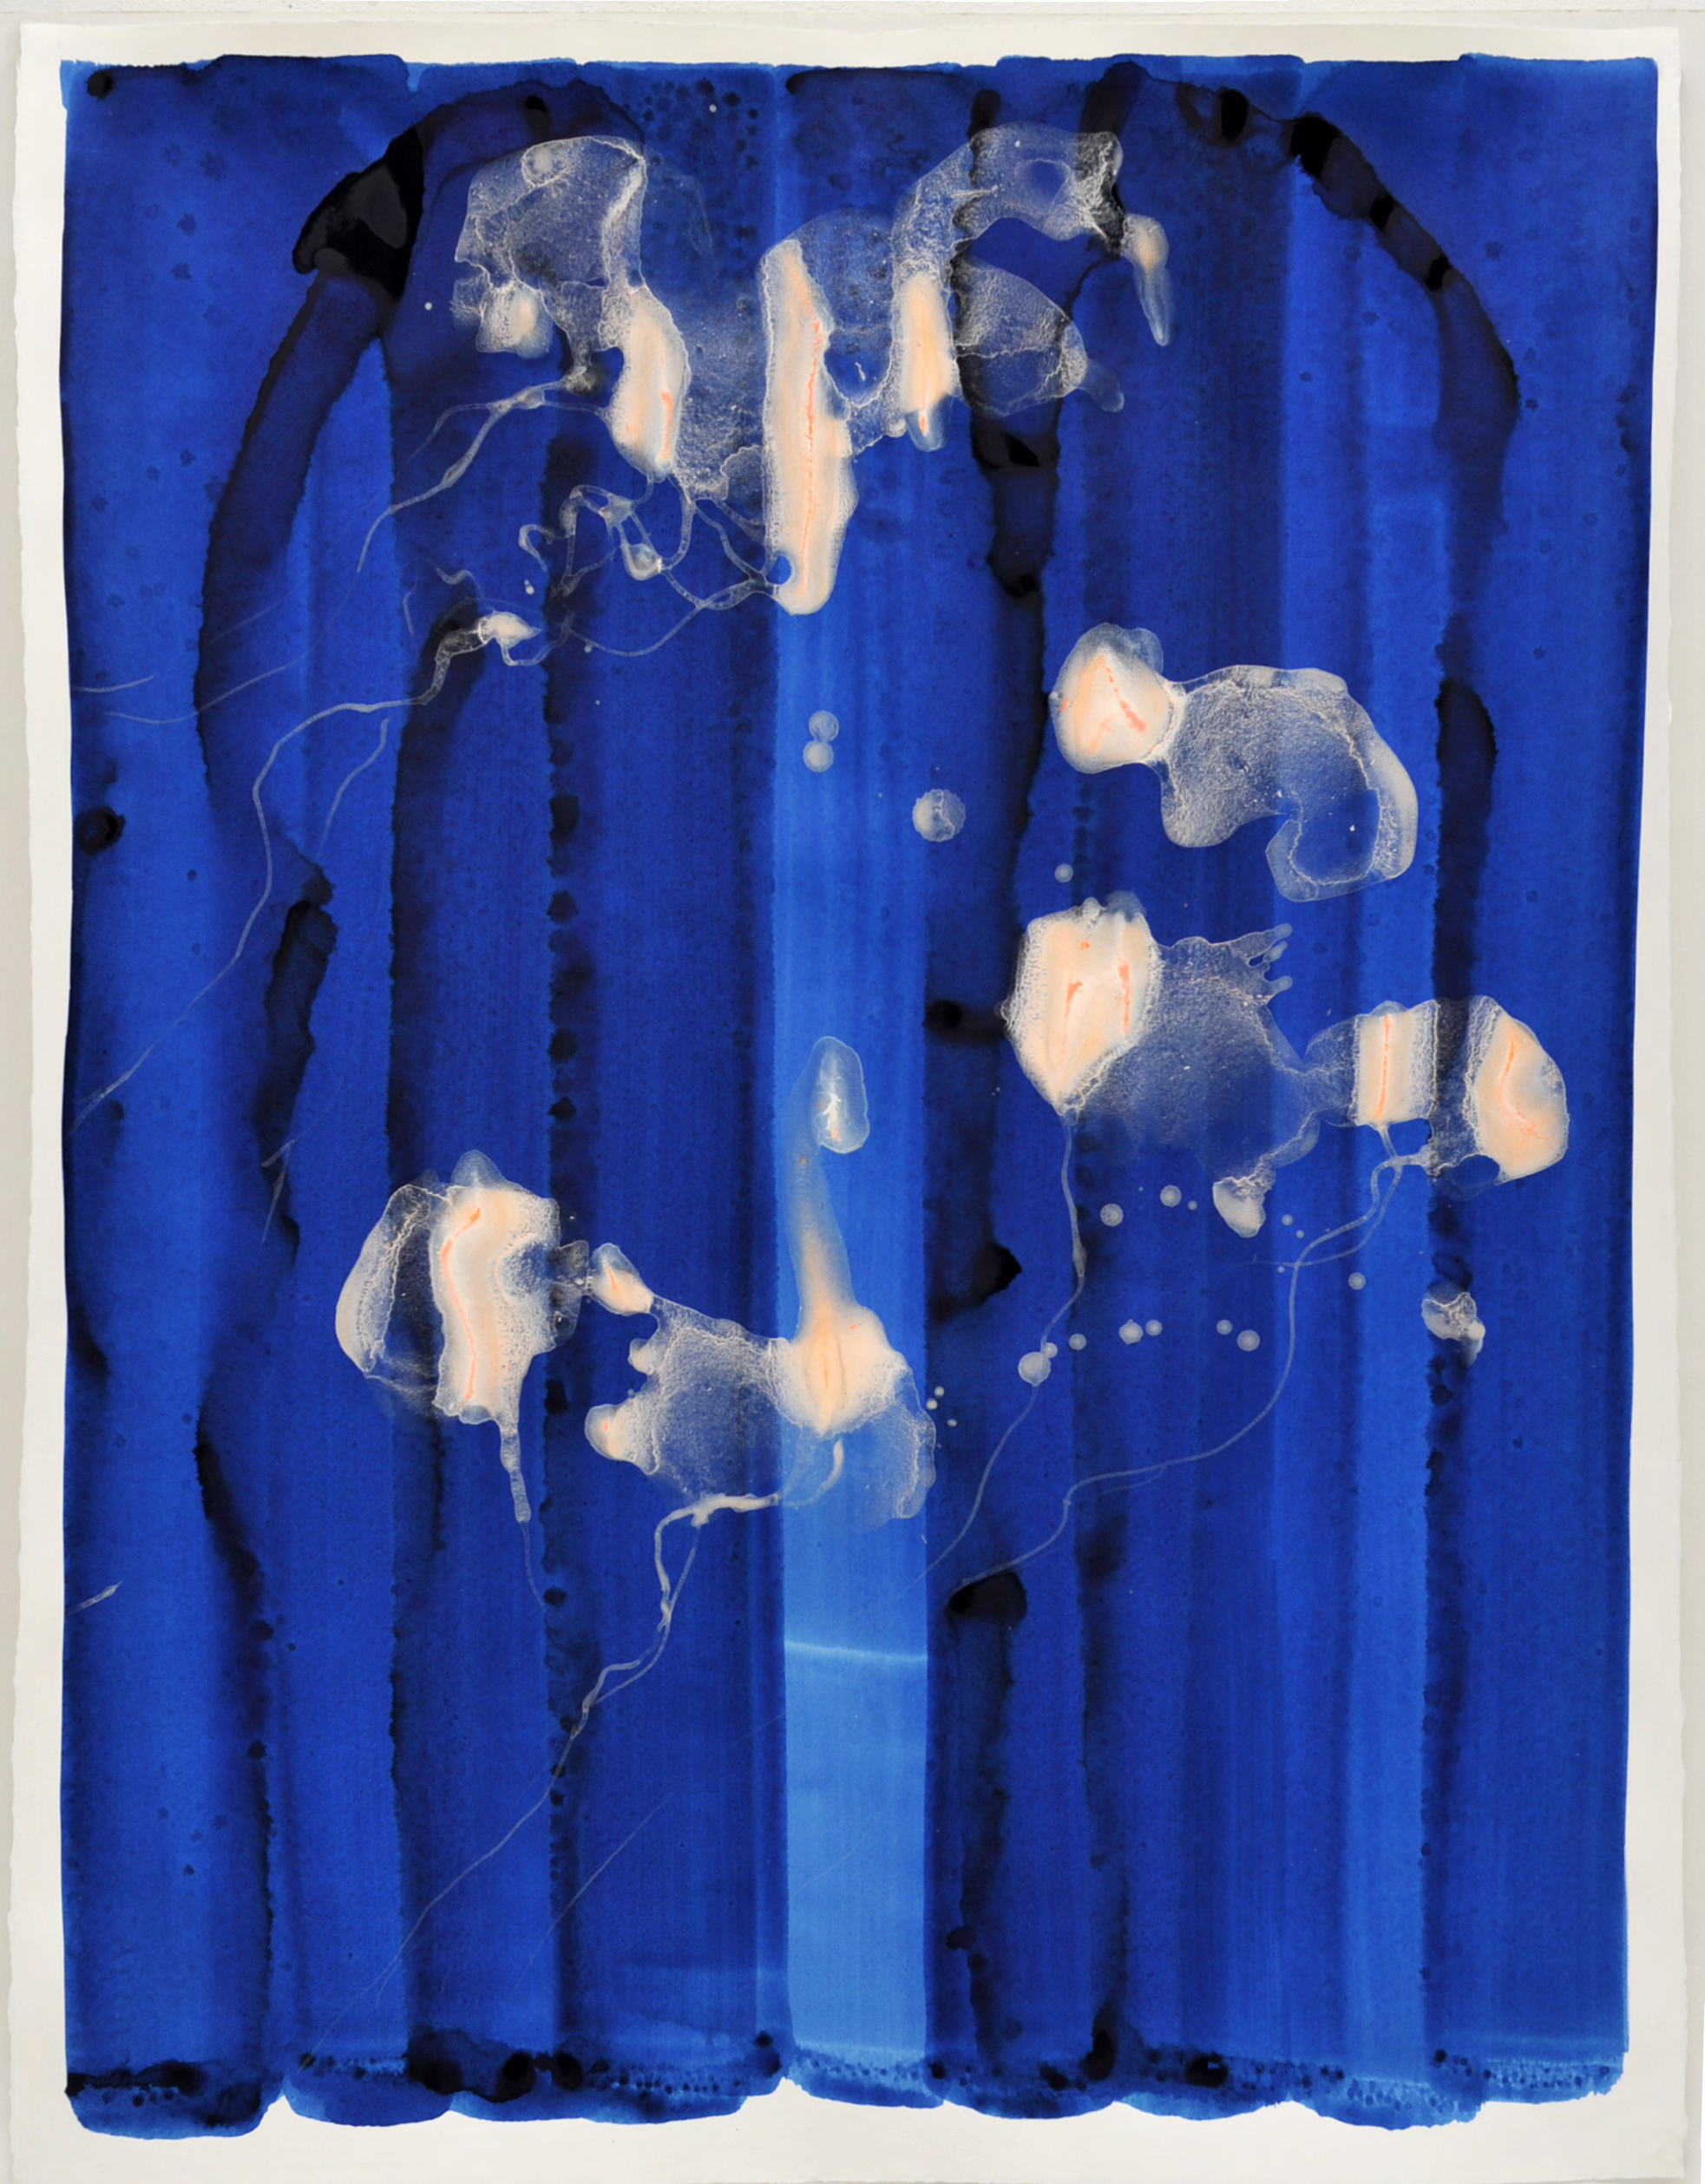 Medusa cyan 1 |deep blue sea